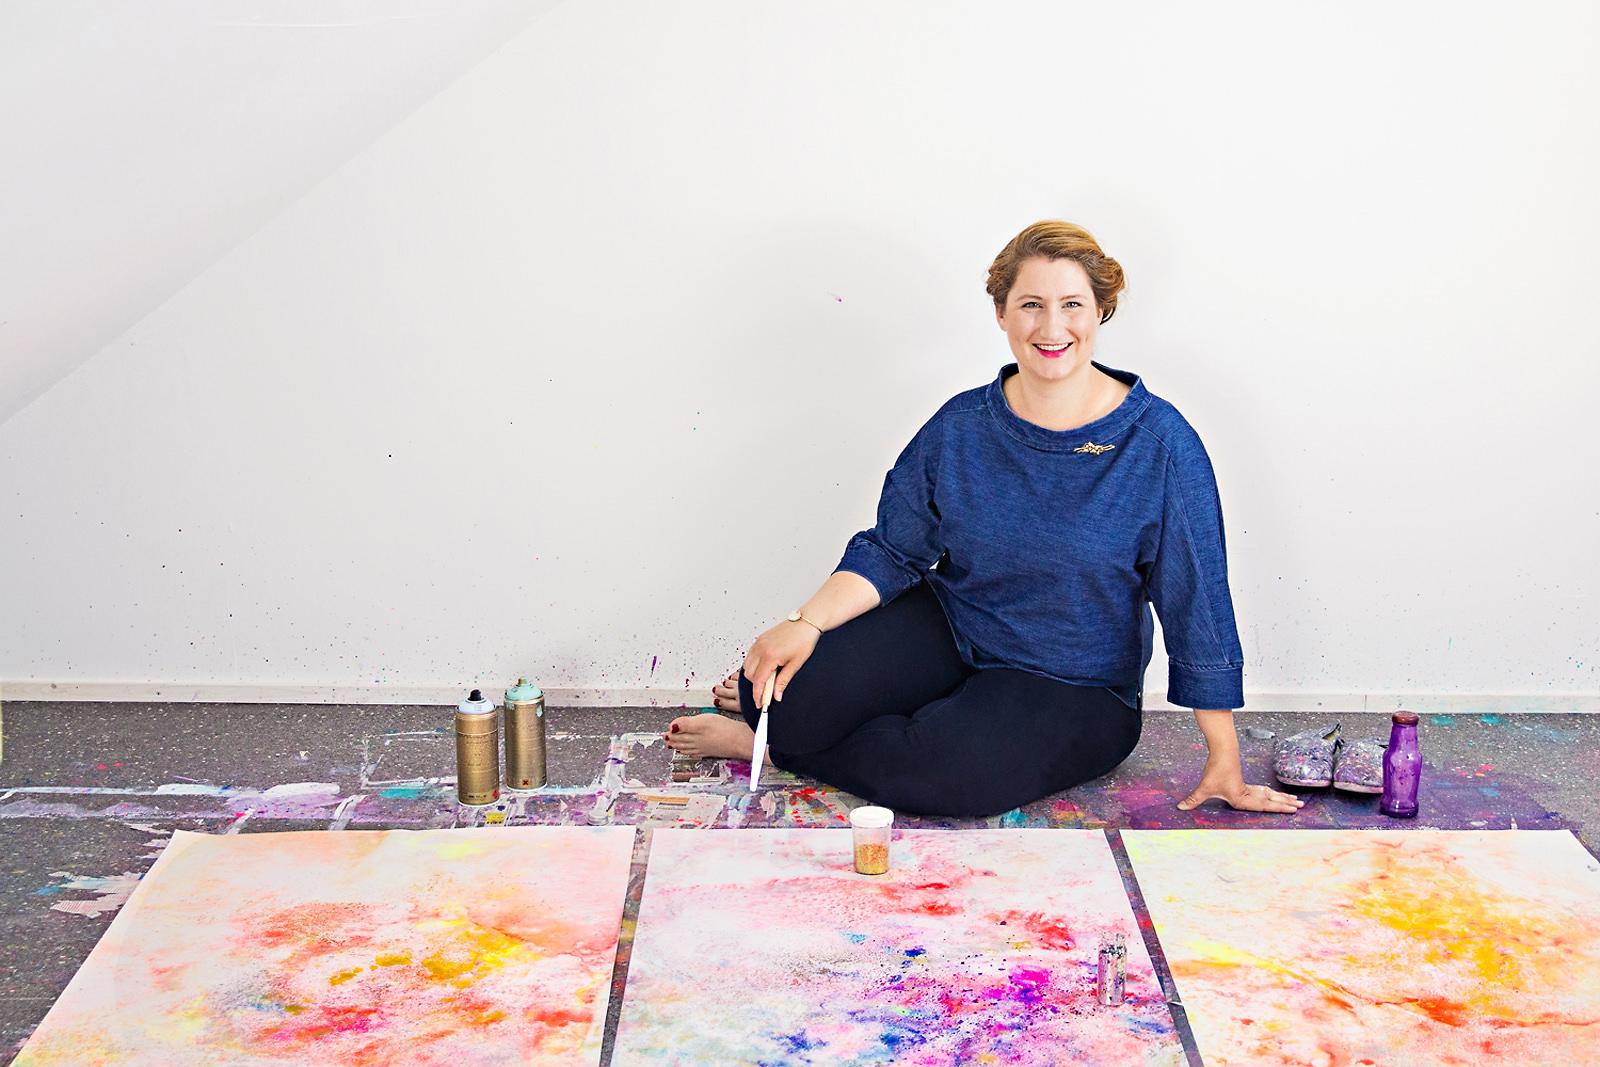 fine-arts-painter-creative-artist